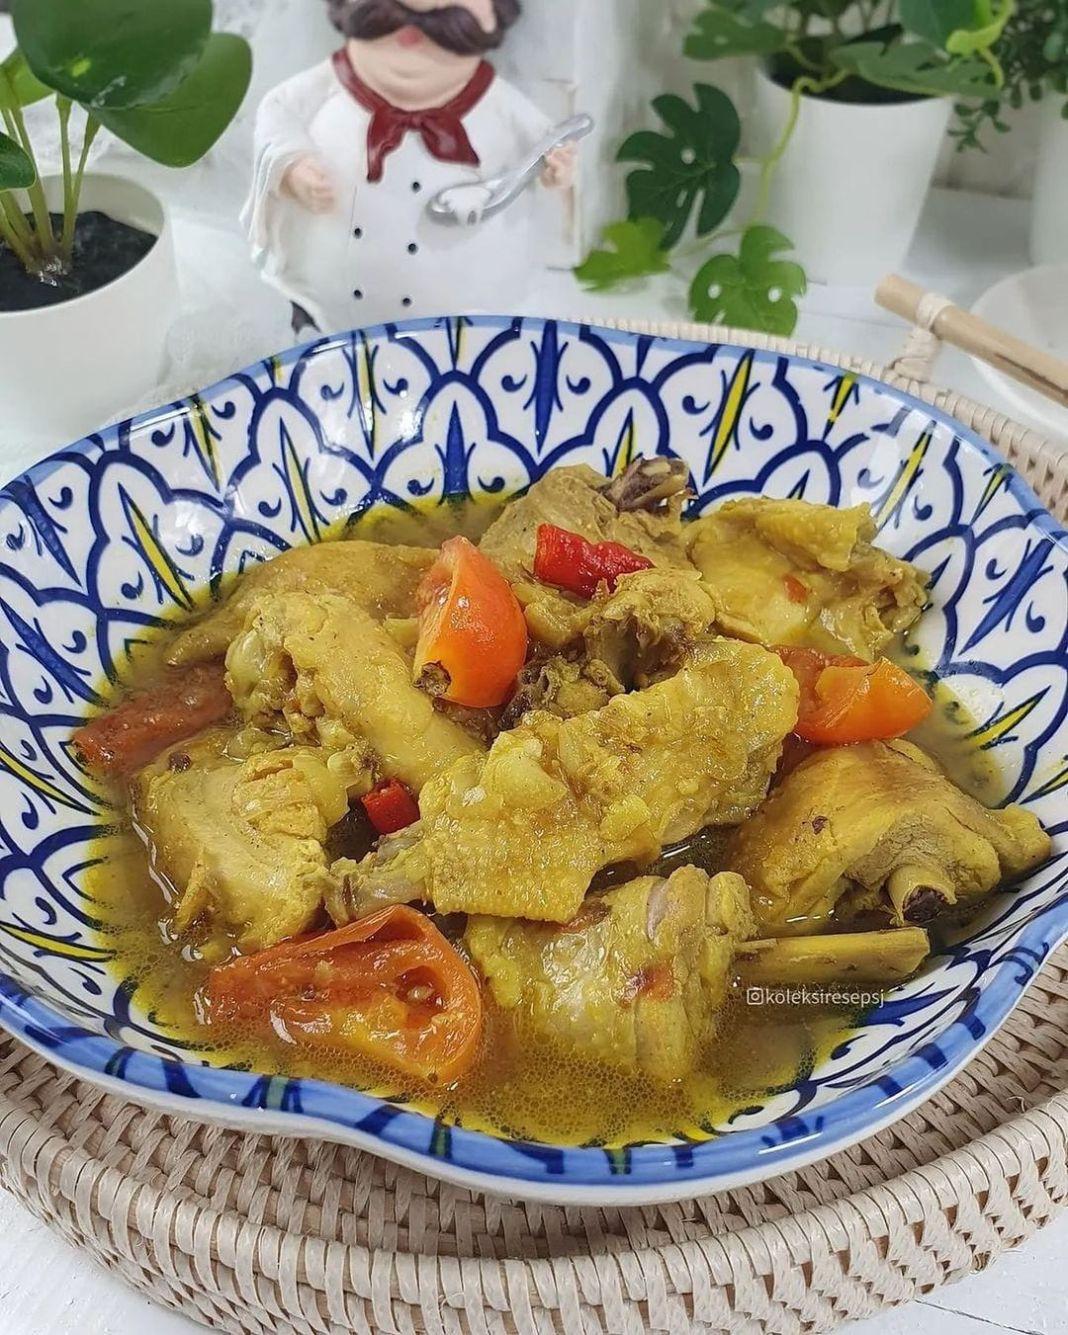 Info kuliner, met pagi momsss!!! siapa suka ayam kuah kuning kaya giniii???  AYAM KUAH KUNING By @koleksirese…